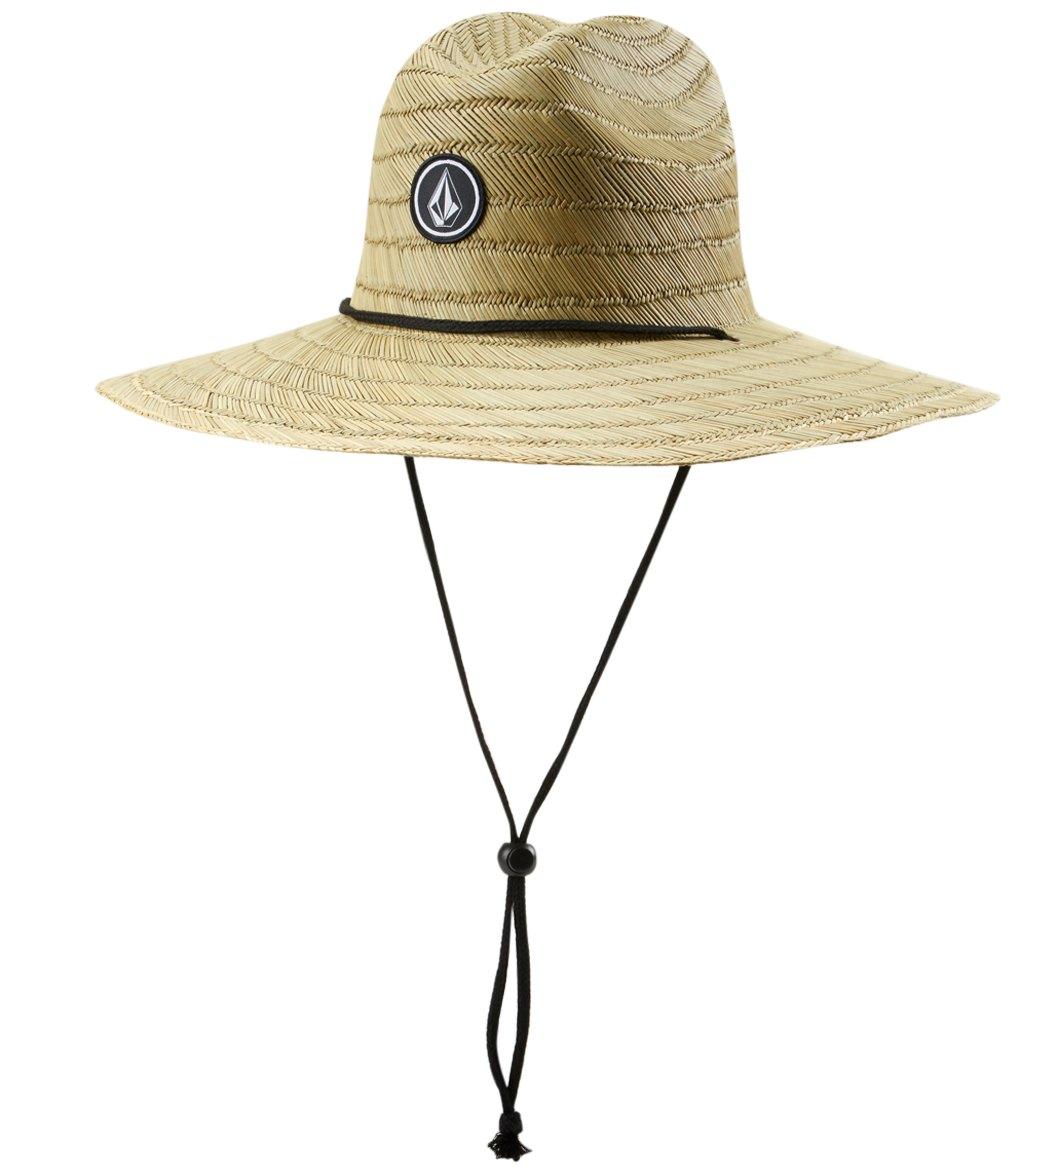 844546aac Volcom Quarter Straw Lifeguard Hat